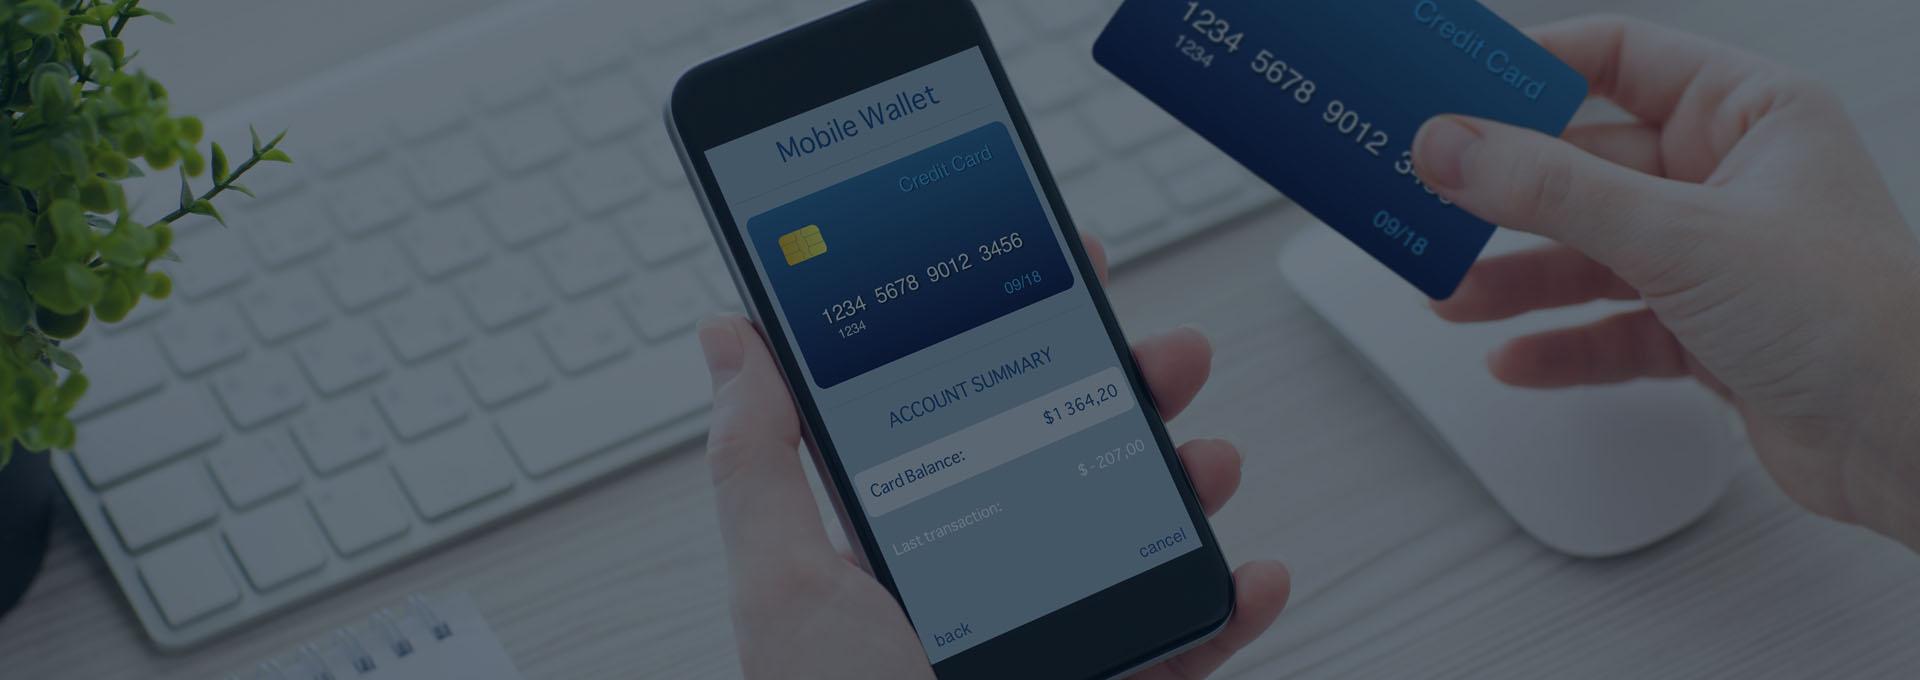 Mobile wallet development-banner-1